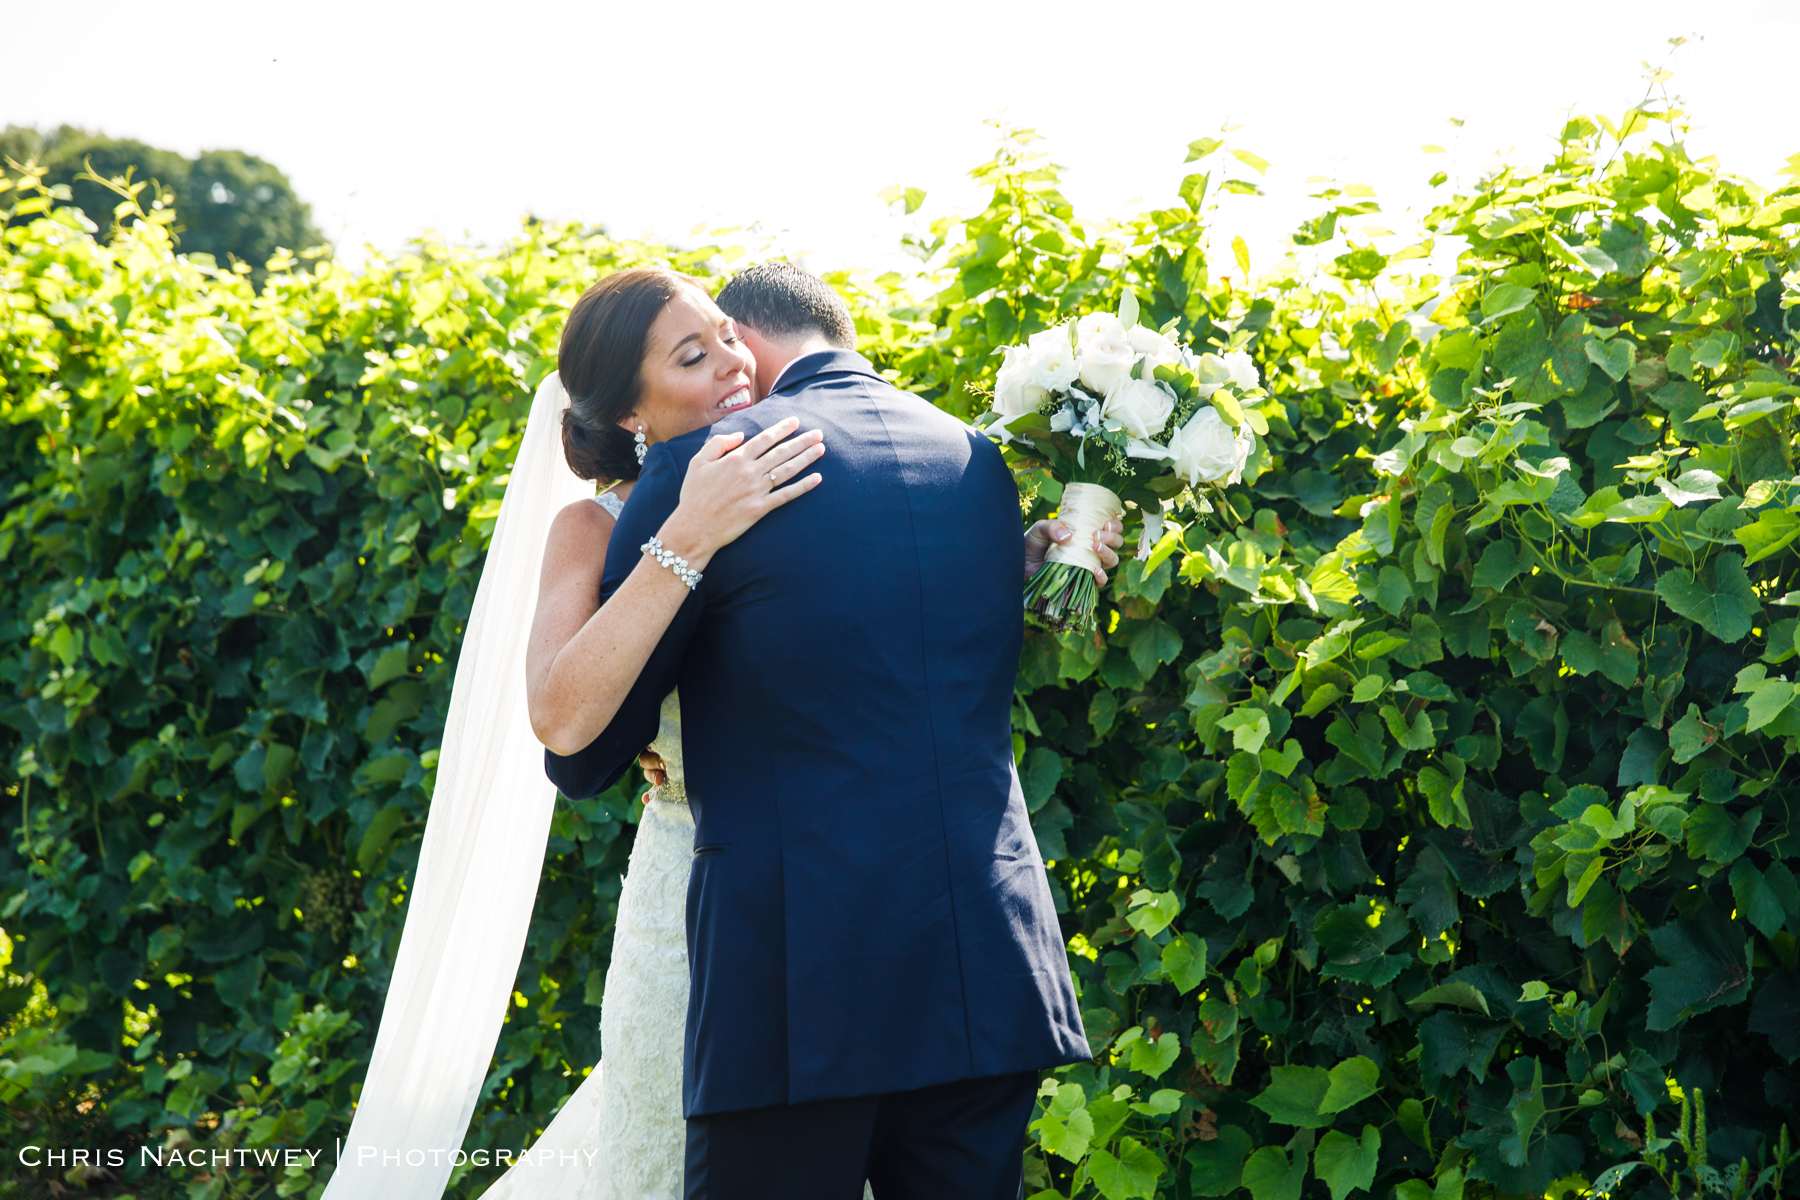 wedding-lake-of-isles-photos-chris-nachtwey-photography-2019-14.jpg